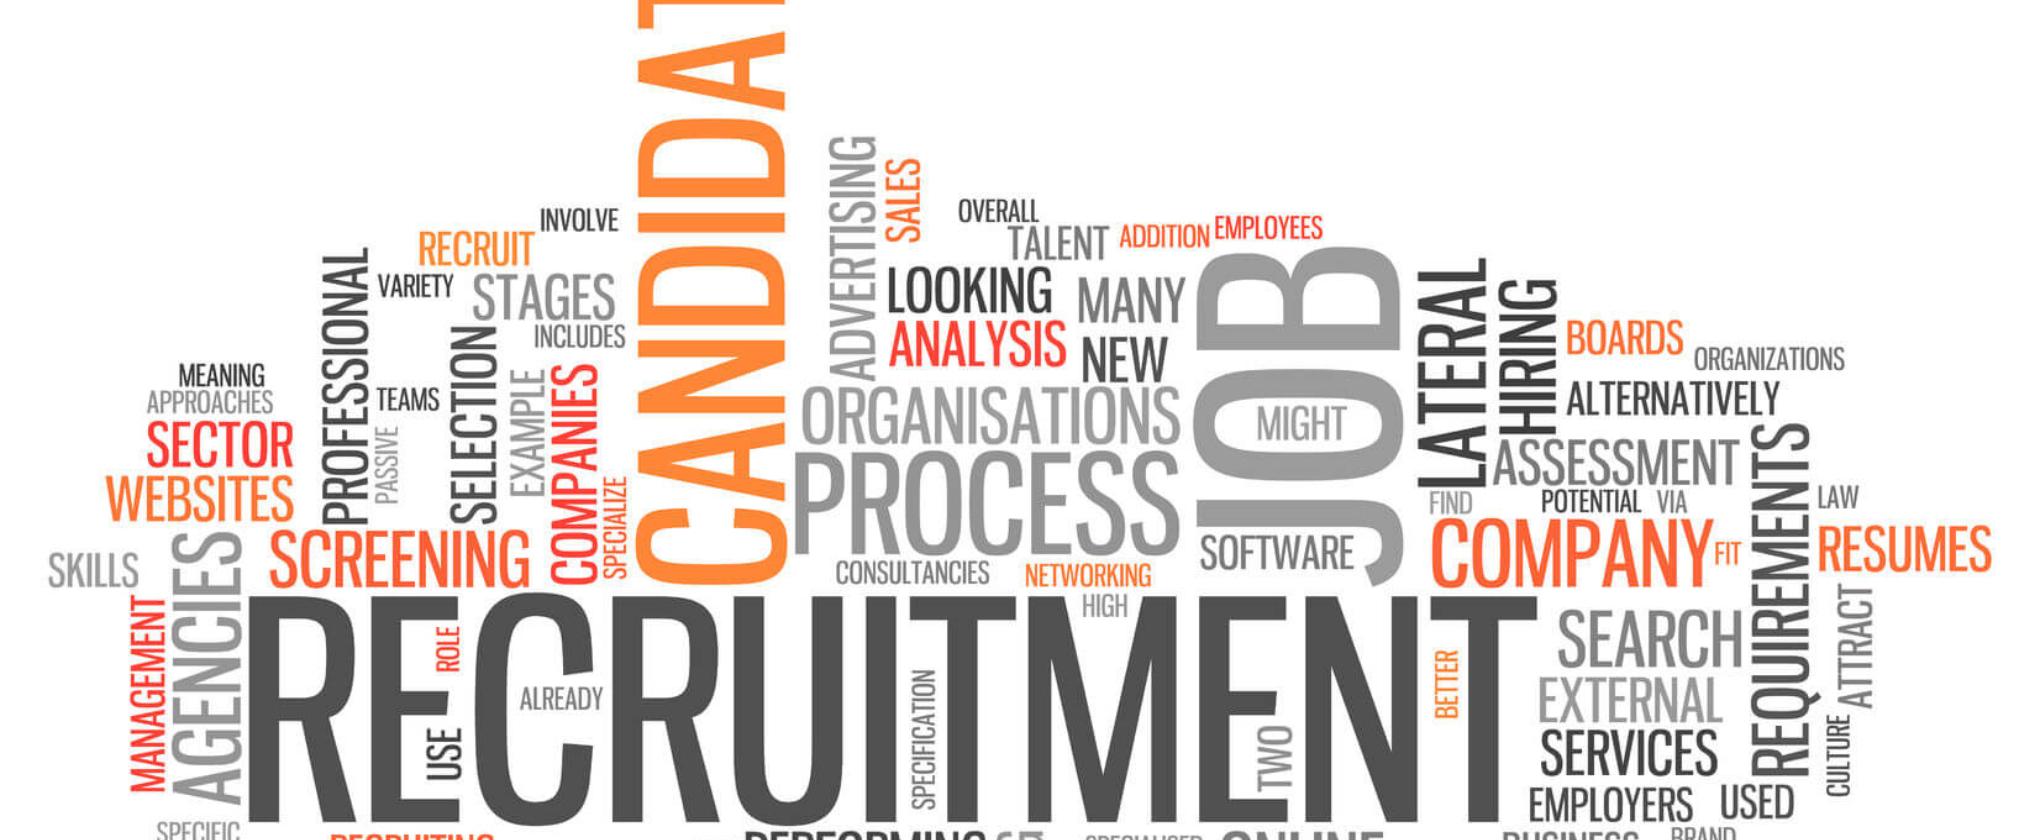 Recruitment Advice on Candidate Screening